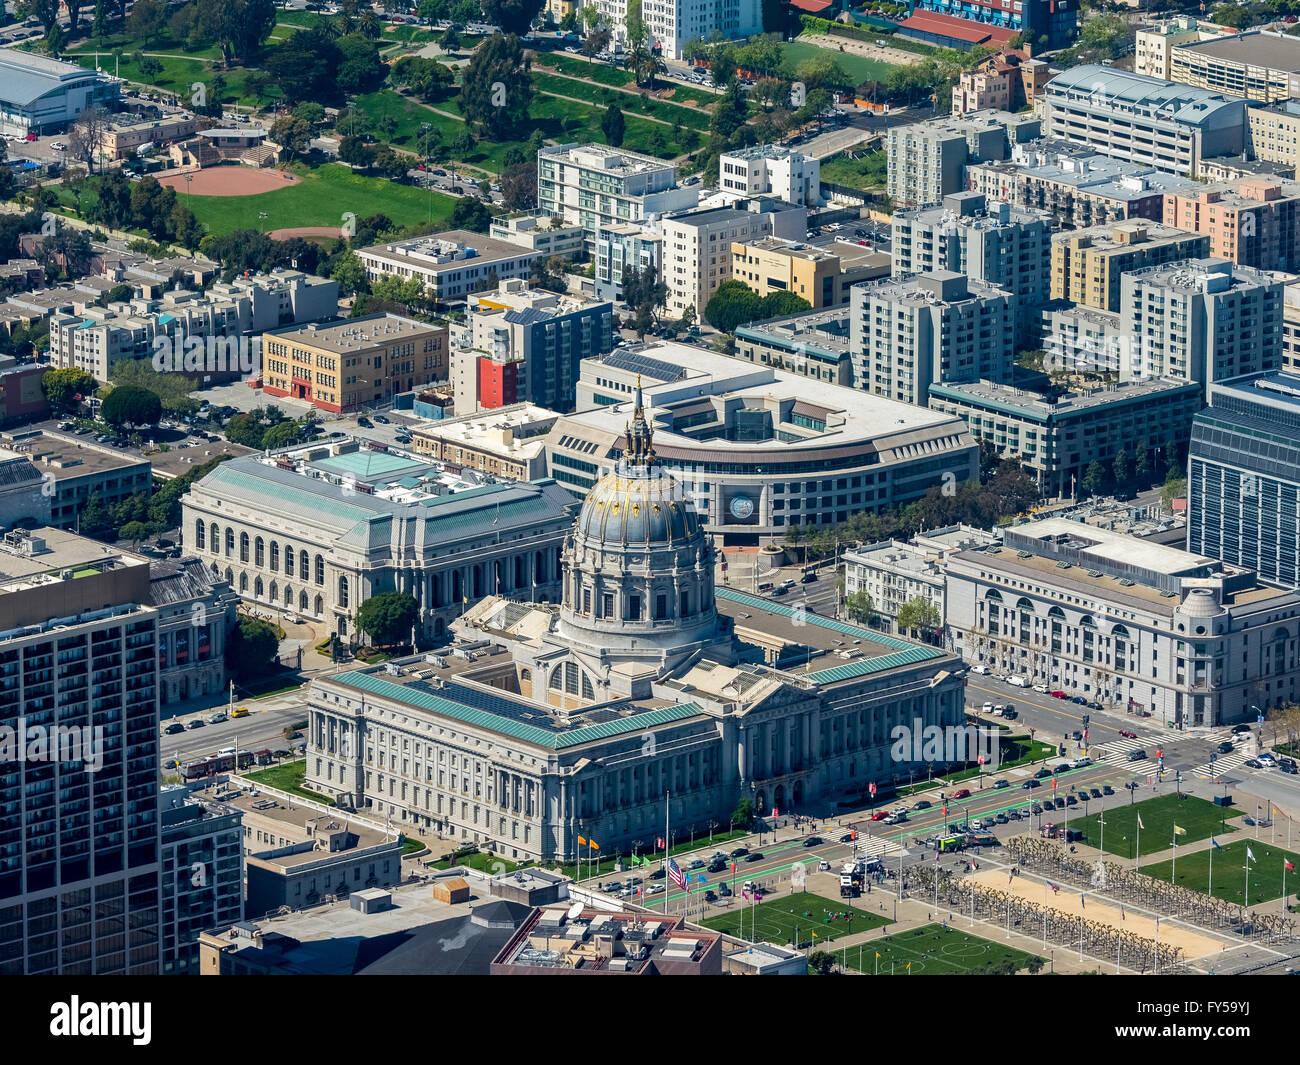 Aerial view, City Hall, Civic Center Plaza, Veterans Building, War Memorial Opera House, San Francisco, San Francisco - Stock Image